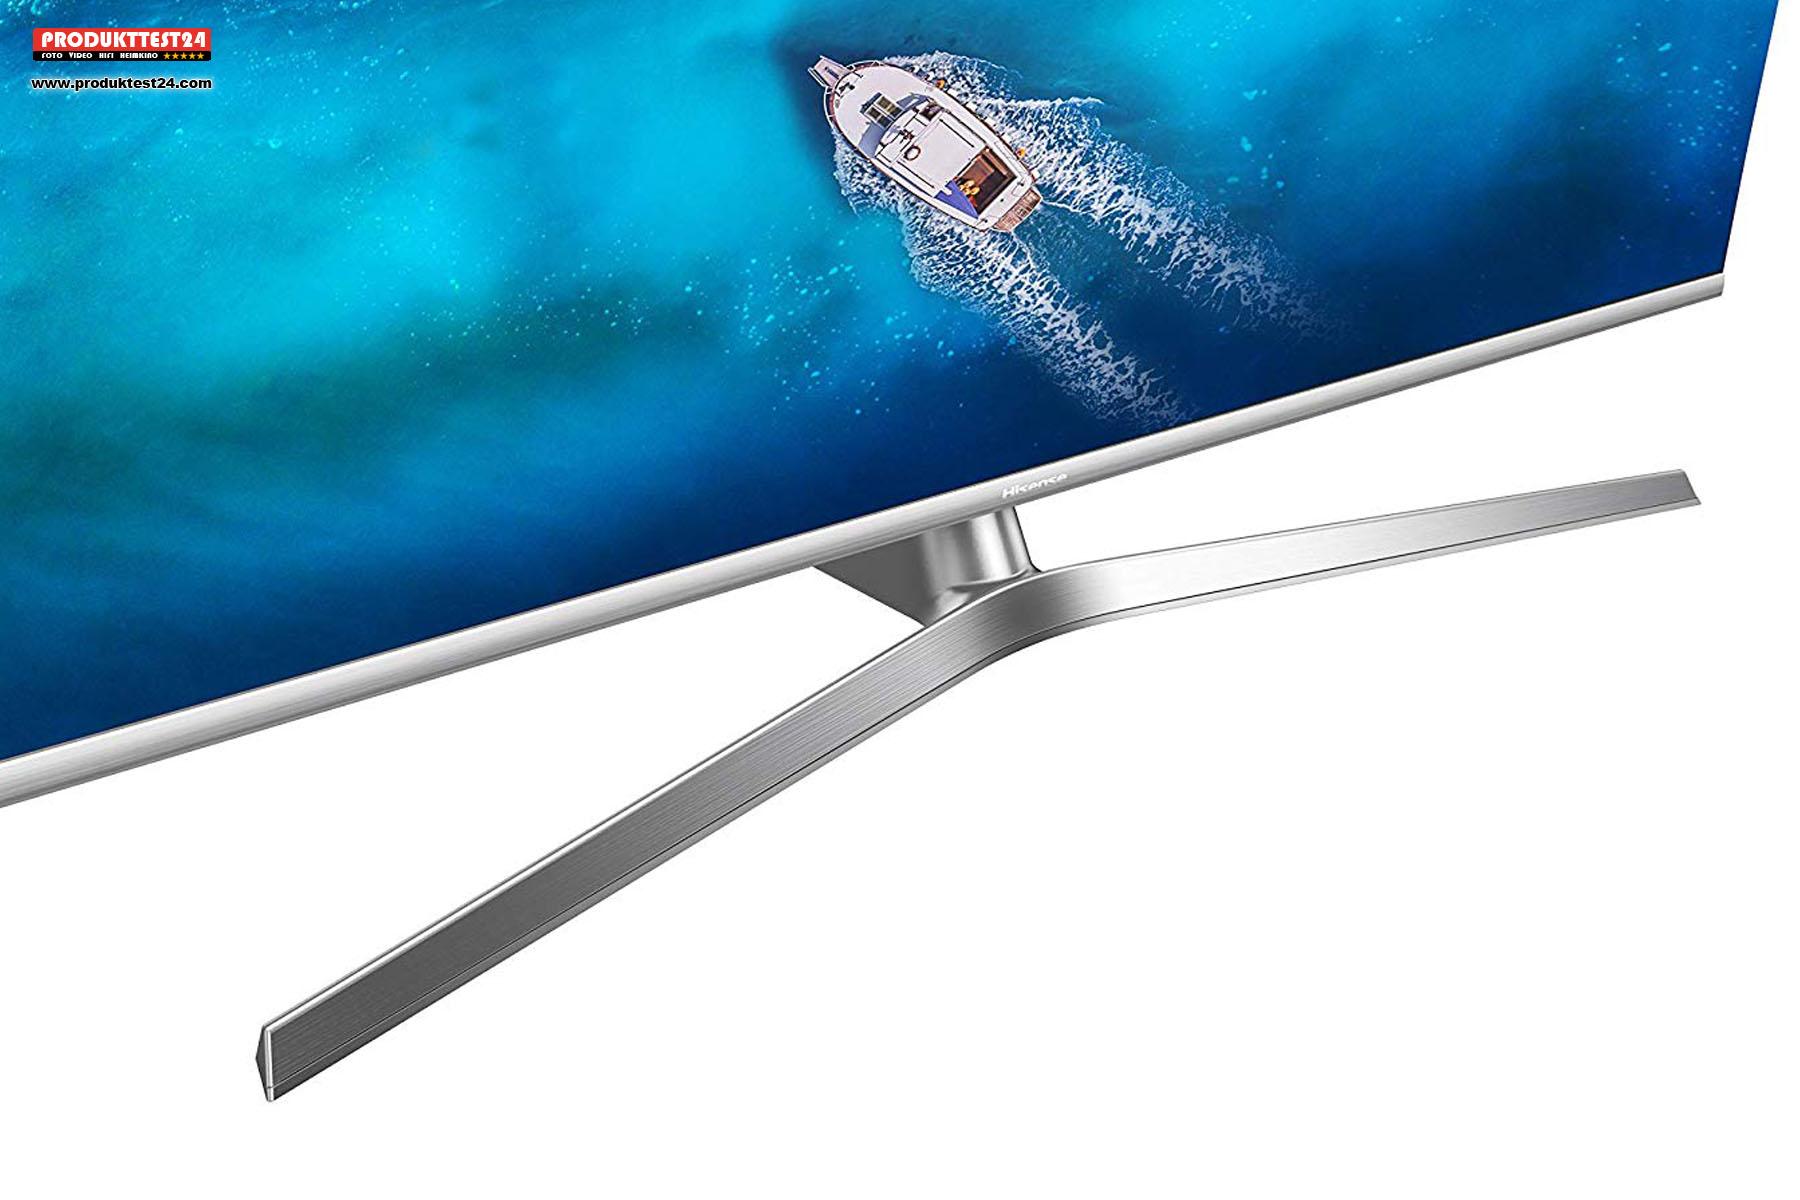 Metall Standfuß des Hisense H55U7B ULED Fernseher